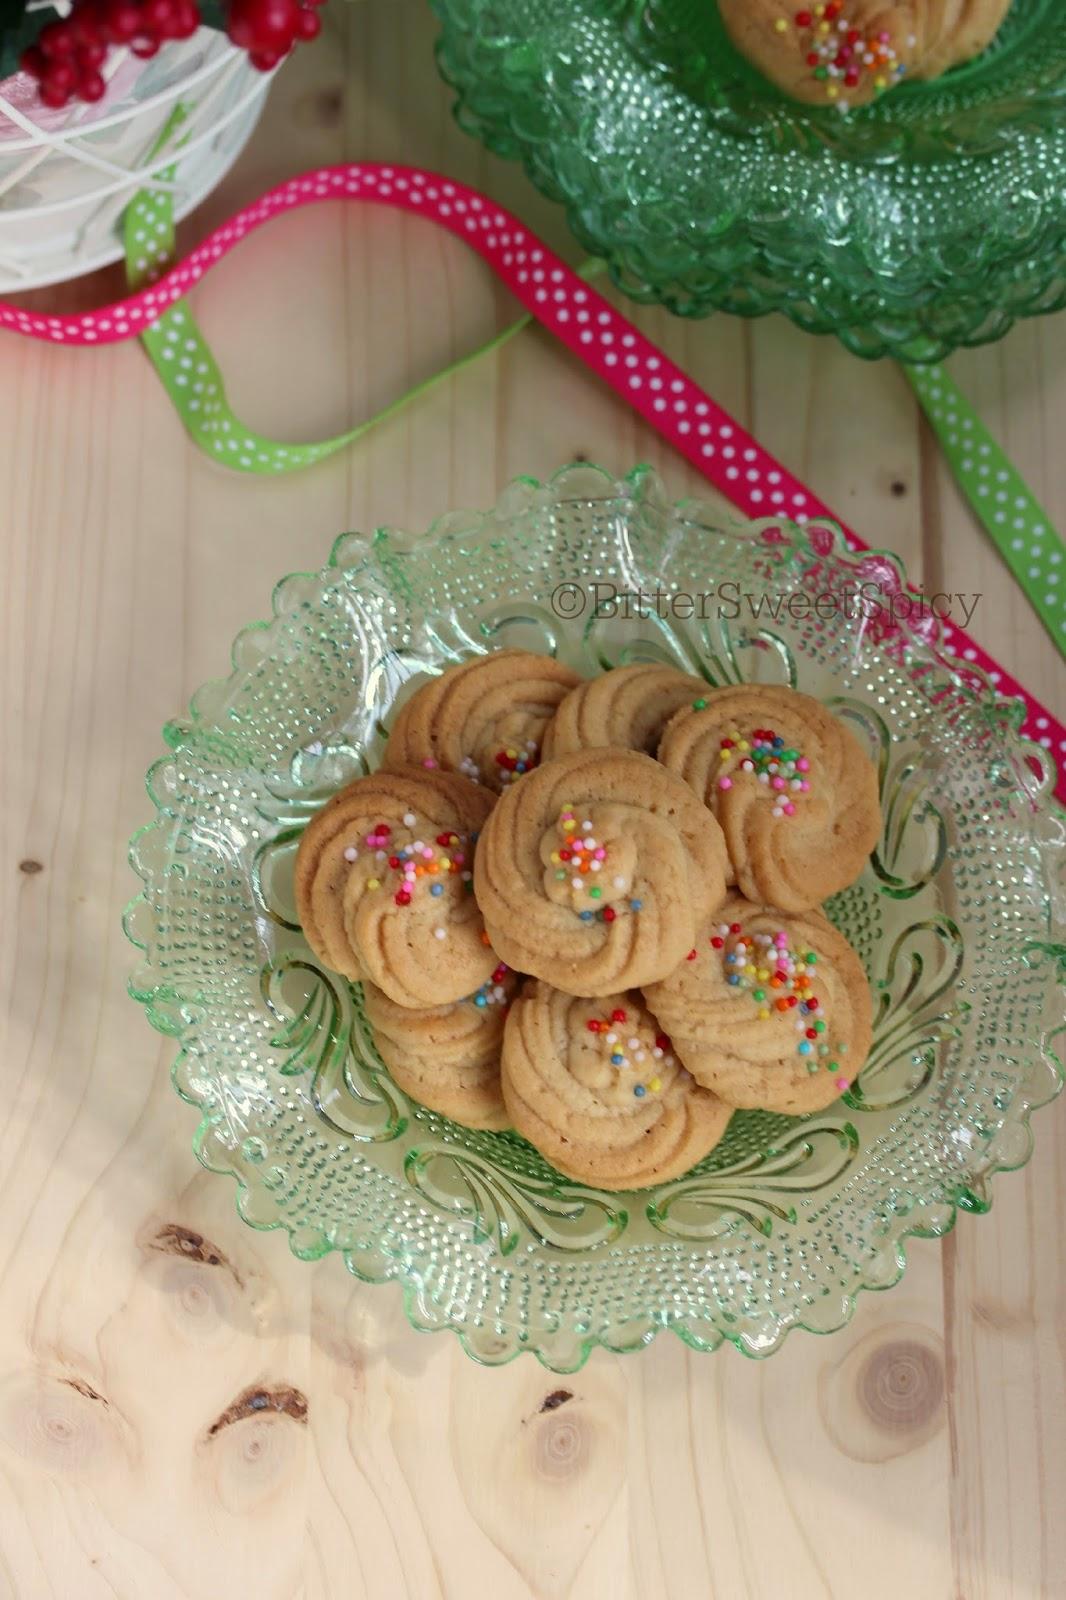 Vanilla Malted Cookies @ BitterSweetSpicy